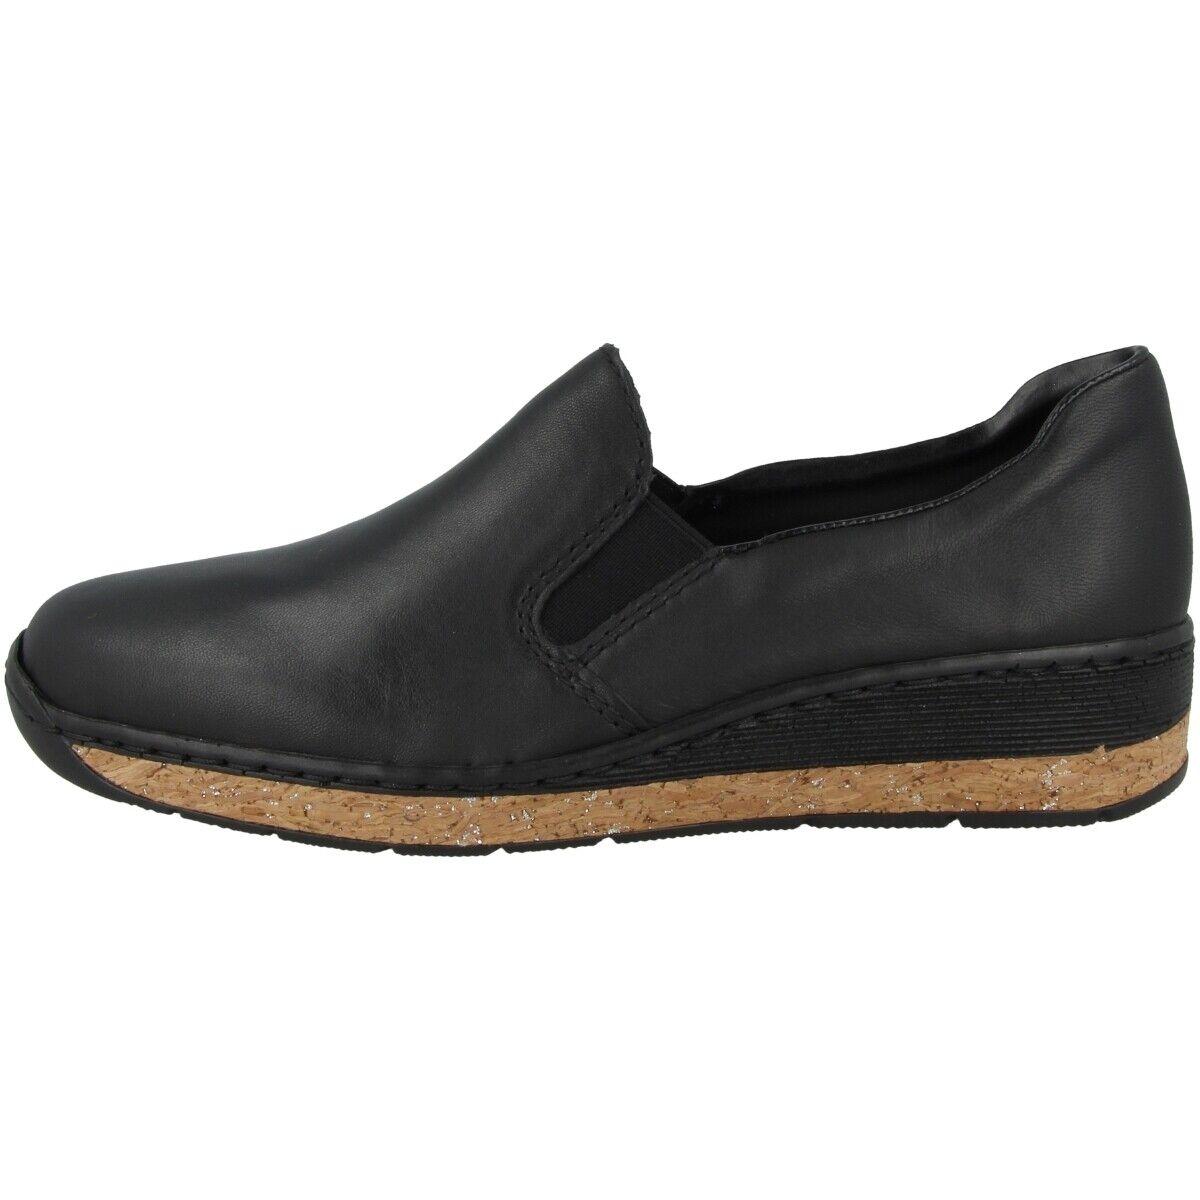 Rieker 59766-00 Donne schuhe damen Pantofola Anti-stress Ballerine schuhe Basse